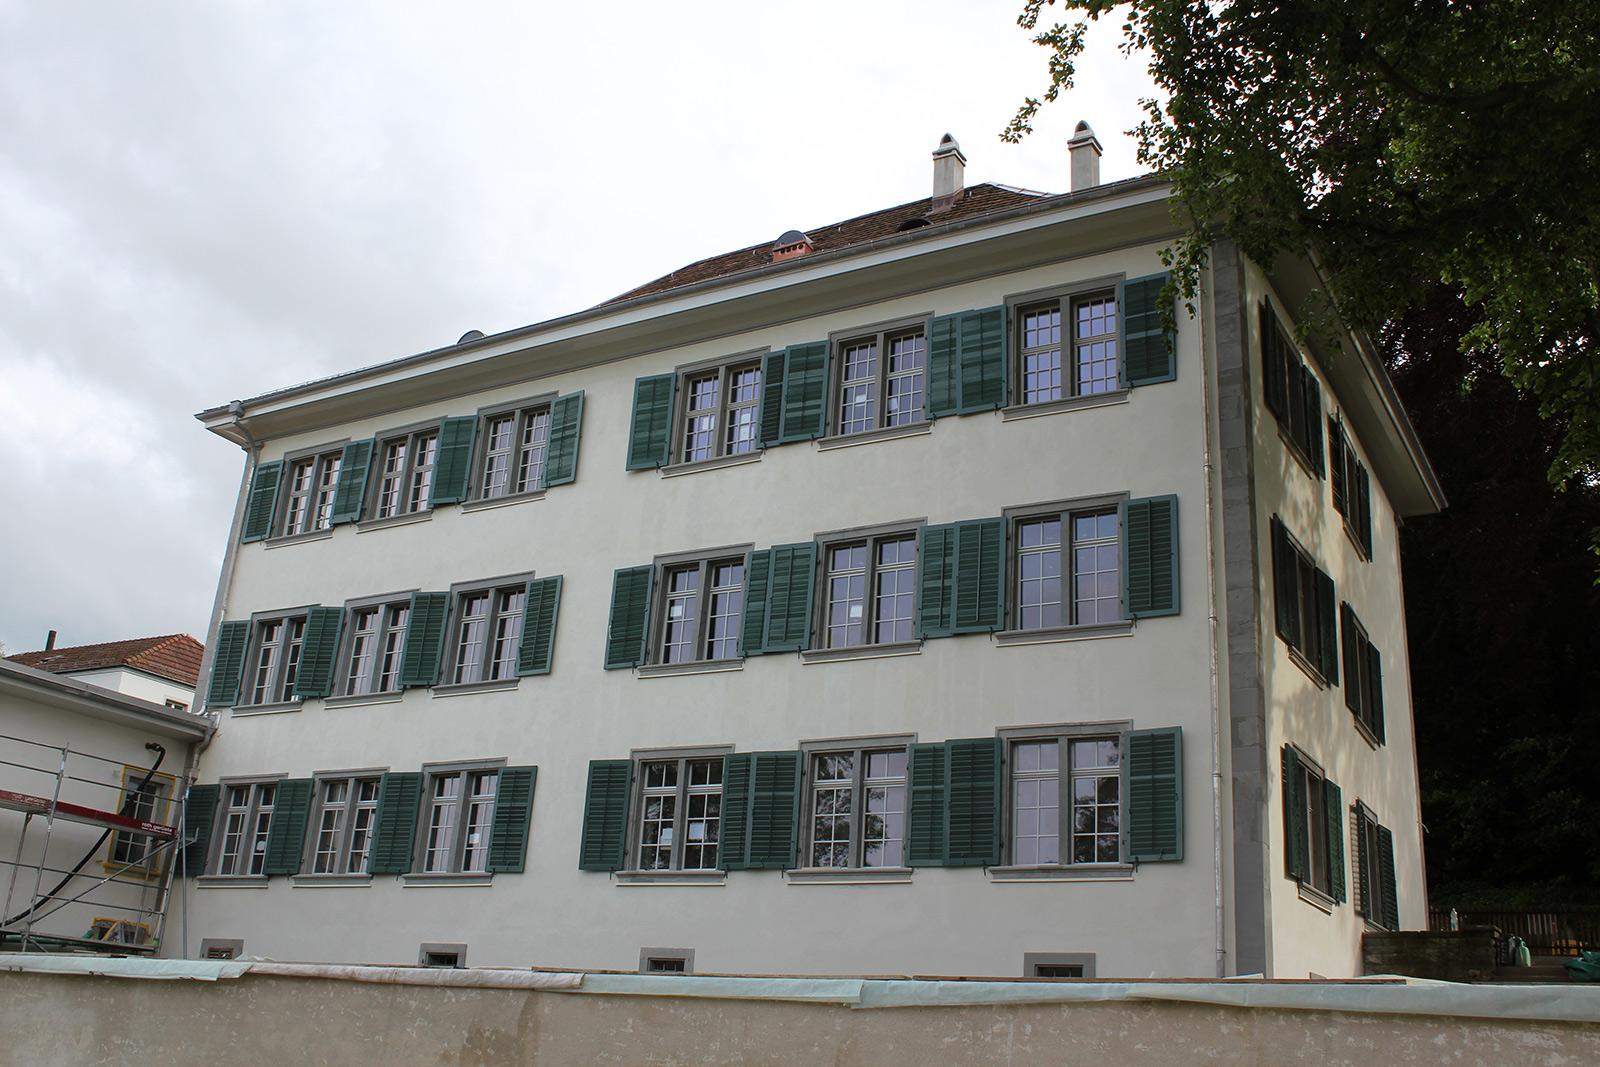 villa schanzengarten b elrainstrasse 15 winterthur historfen historische fenster renovieren. Black Bedroom Furniture Sets. Home Design Ideas